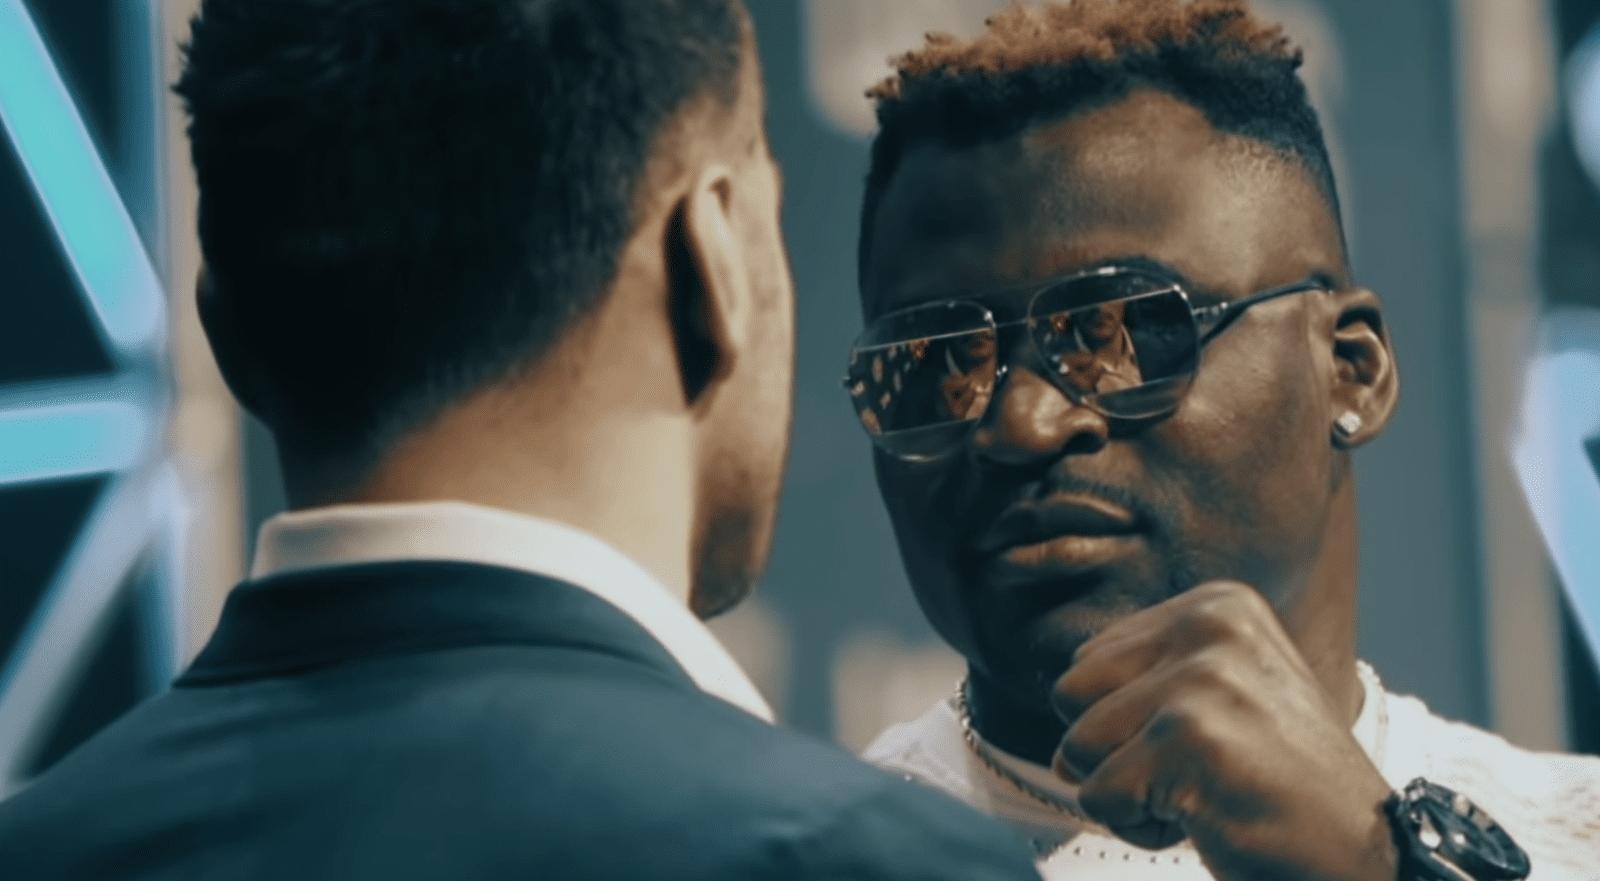 Video: UFC 260 Miocic vs. Ngannou 2 Trailer thumbnail